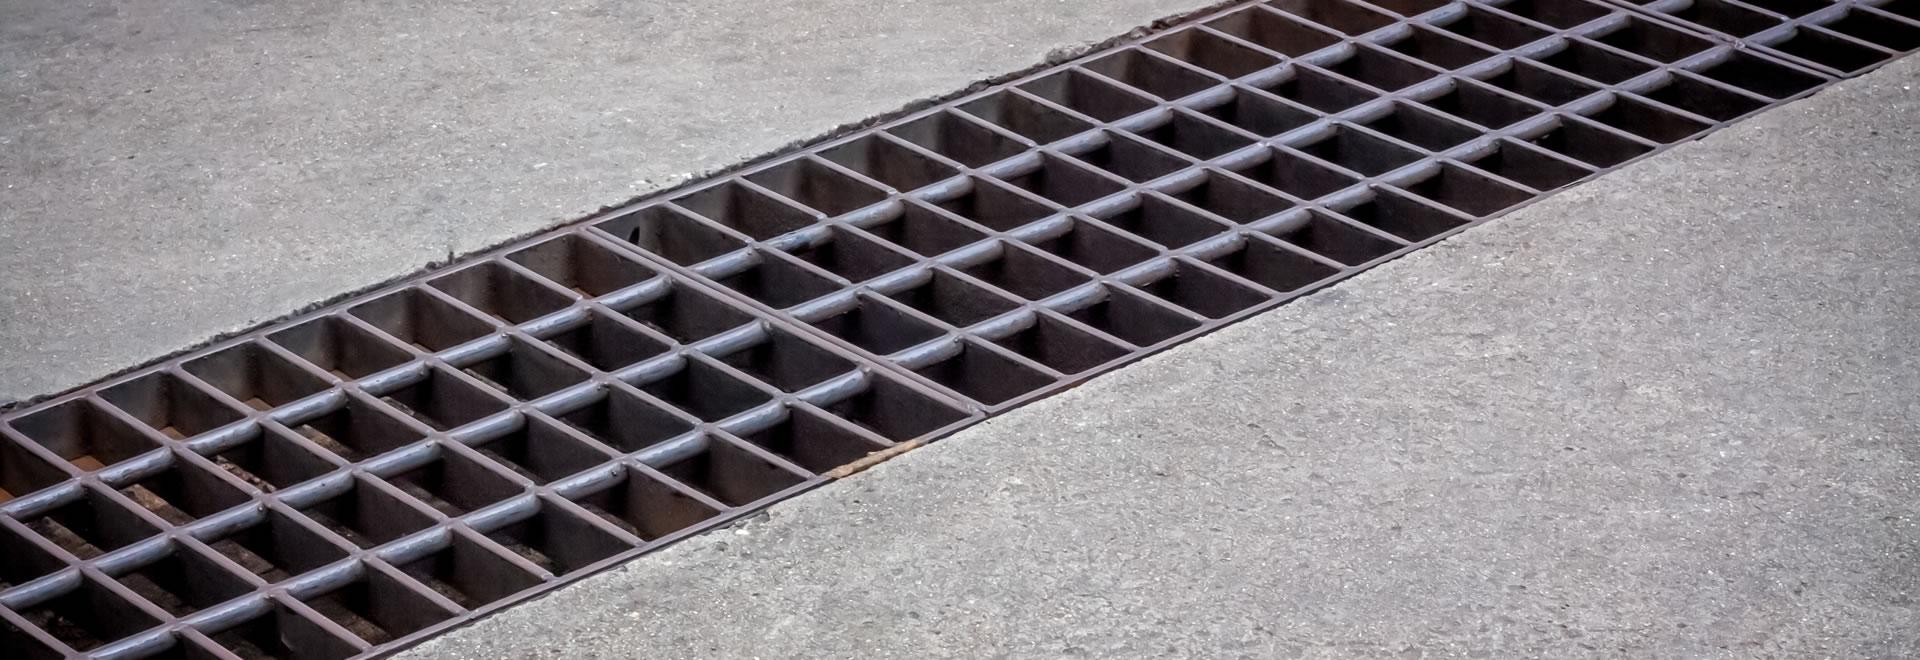 French drain expert